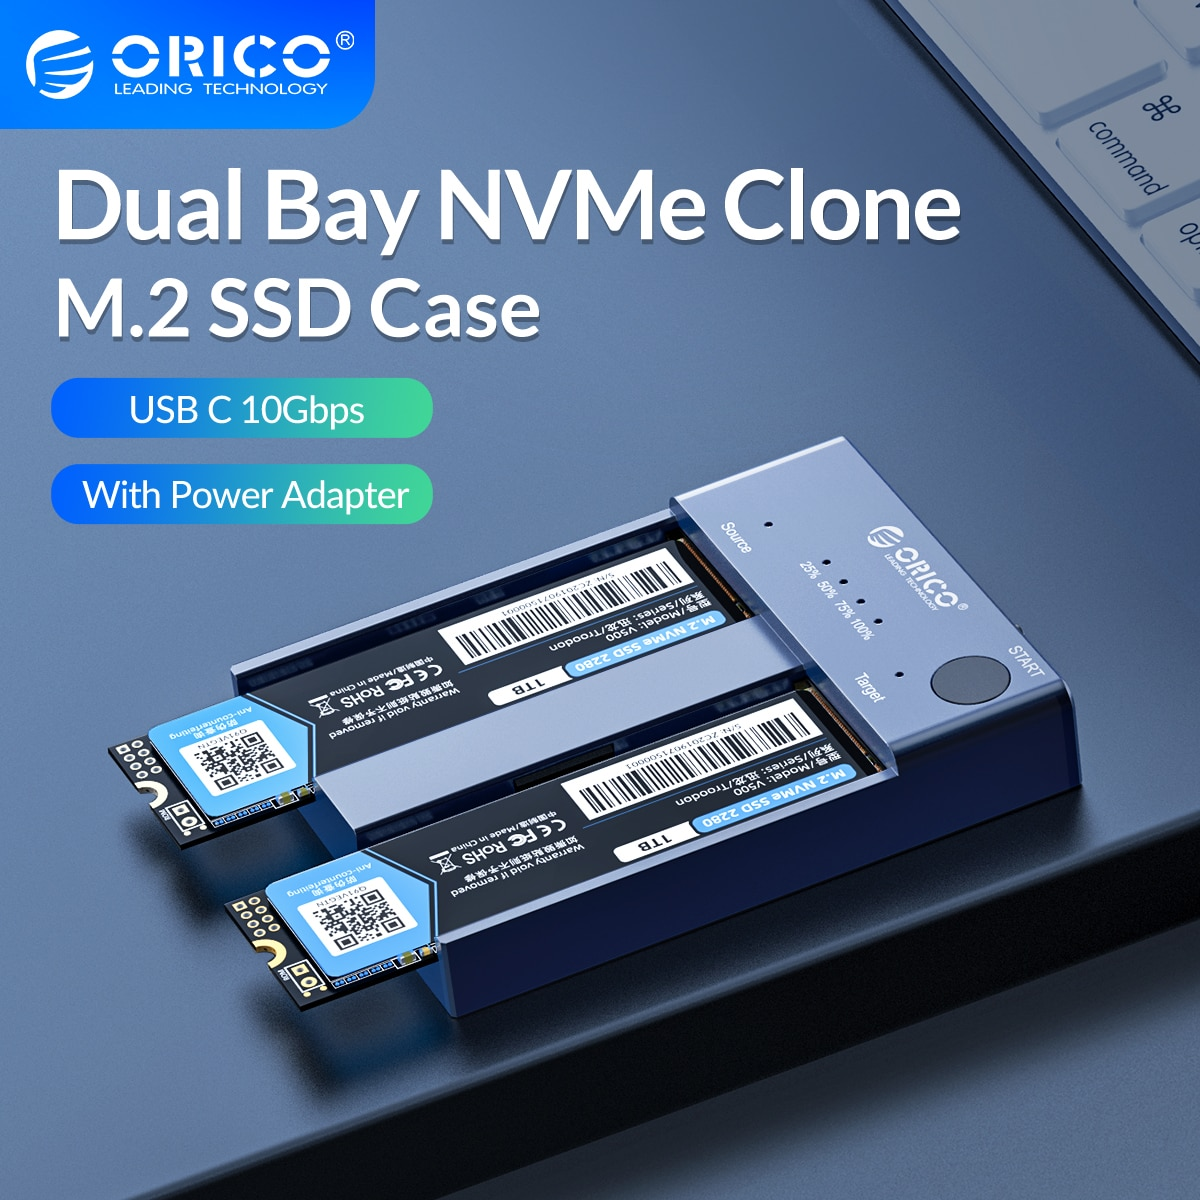 cfast card reader usb3 1 dual port usb a usb c portable gen2 10gbps cfast reader ORICO Dual Bay M.2 NVME SSD Enclosure Offline Clone USB C 3.1 Gen2 10Gbps For M Key & M/B Key NVME PCIe SSD Hard Drive Reader